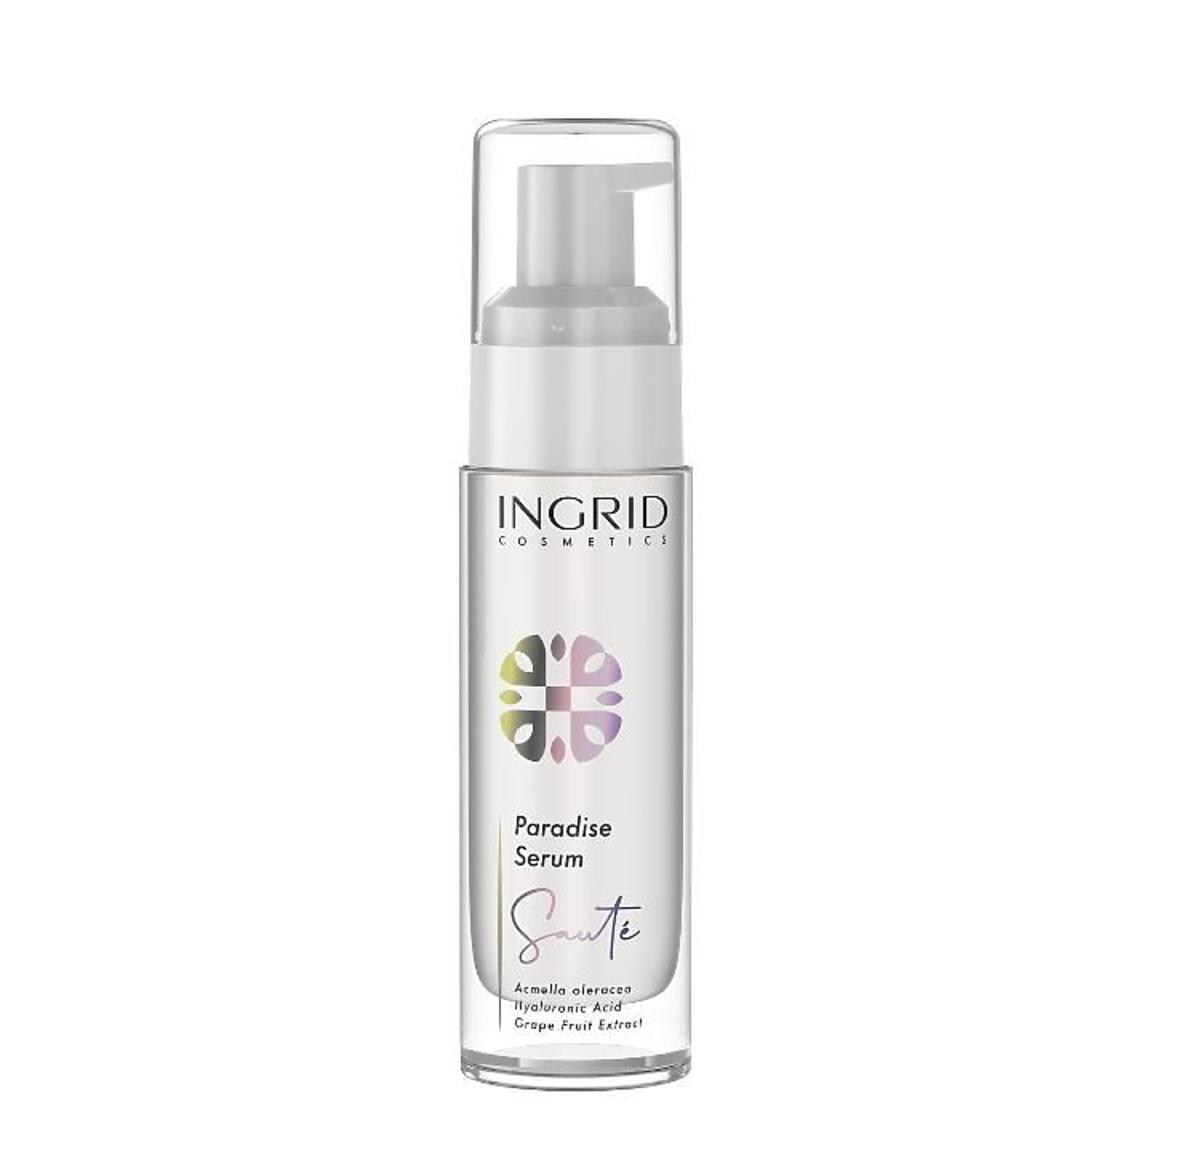 Serum Paradise Ingrid Cosmetics